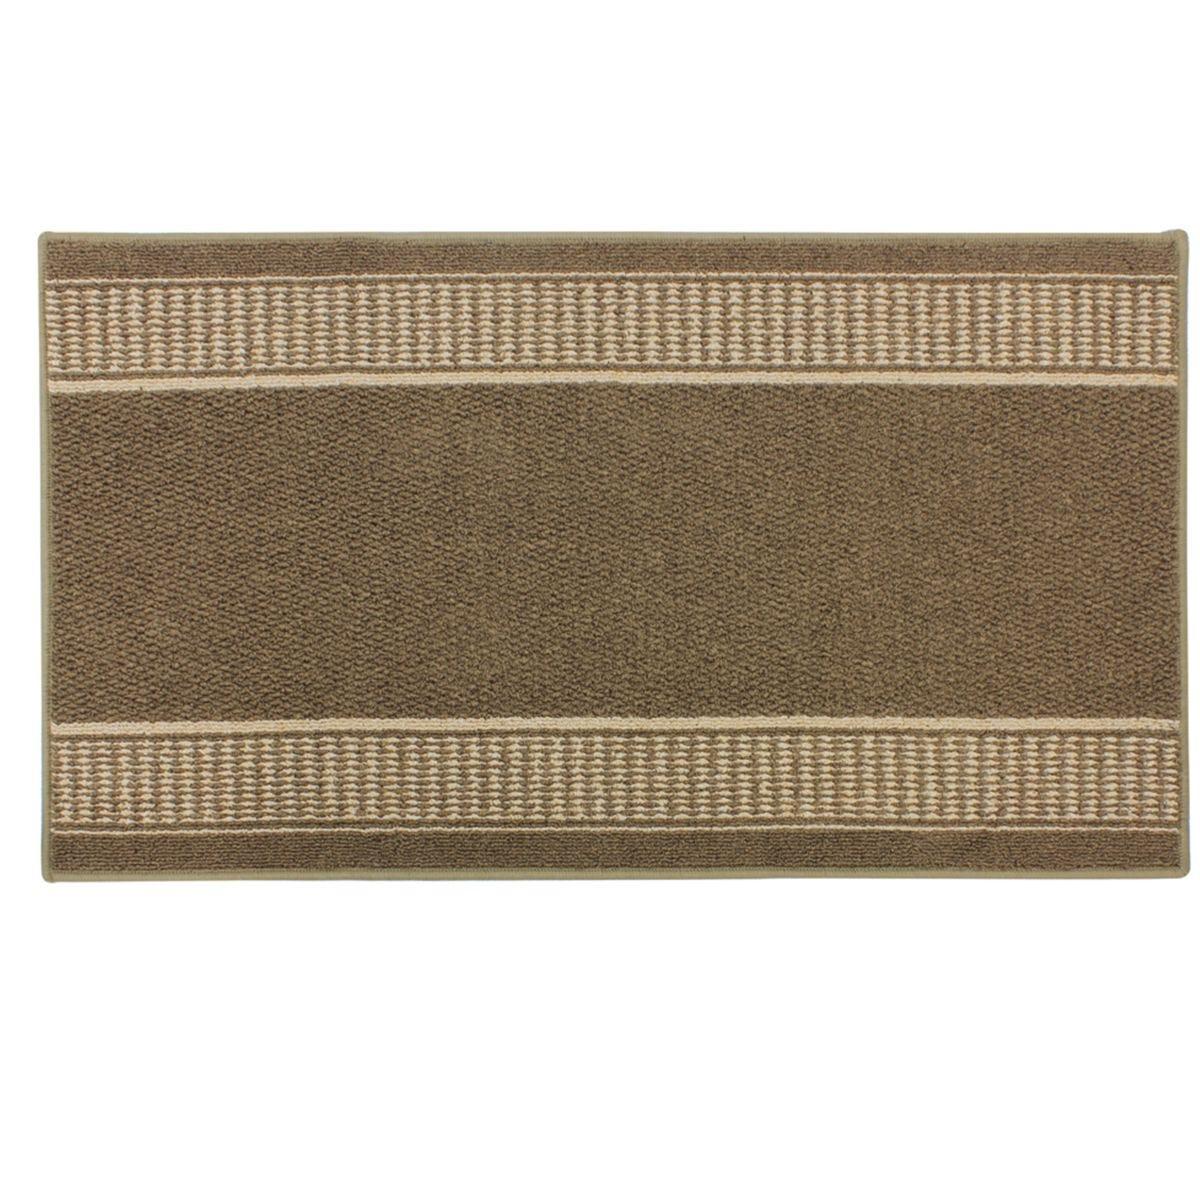 JVL 67x120cm Bergamo Runner Machine Washable Doormat - Brown/Beige